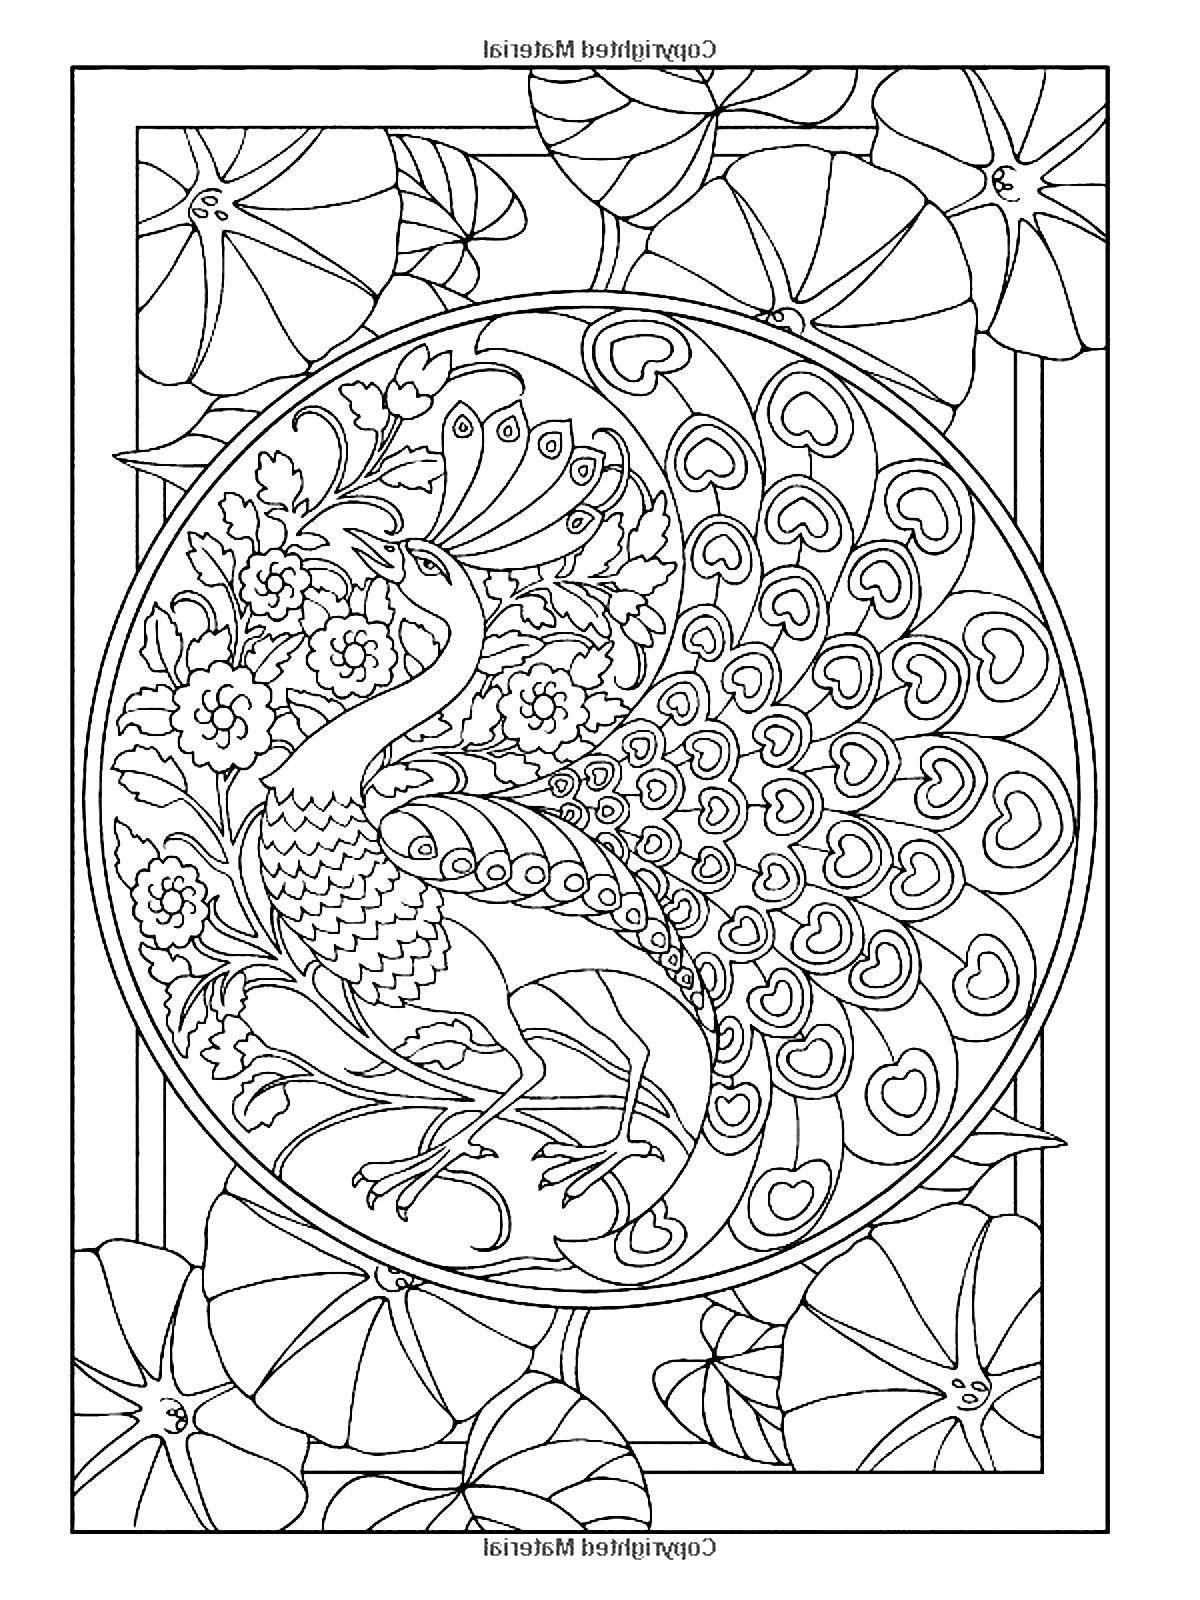 free printable peackoxk mosaic art coloring pages | Free coloring page «coloring-adult-art-nouveau-style ...